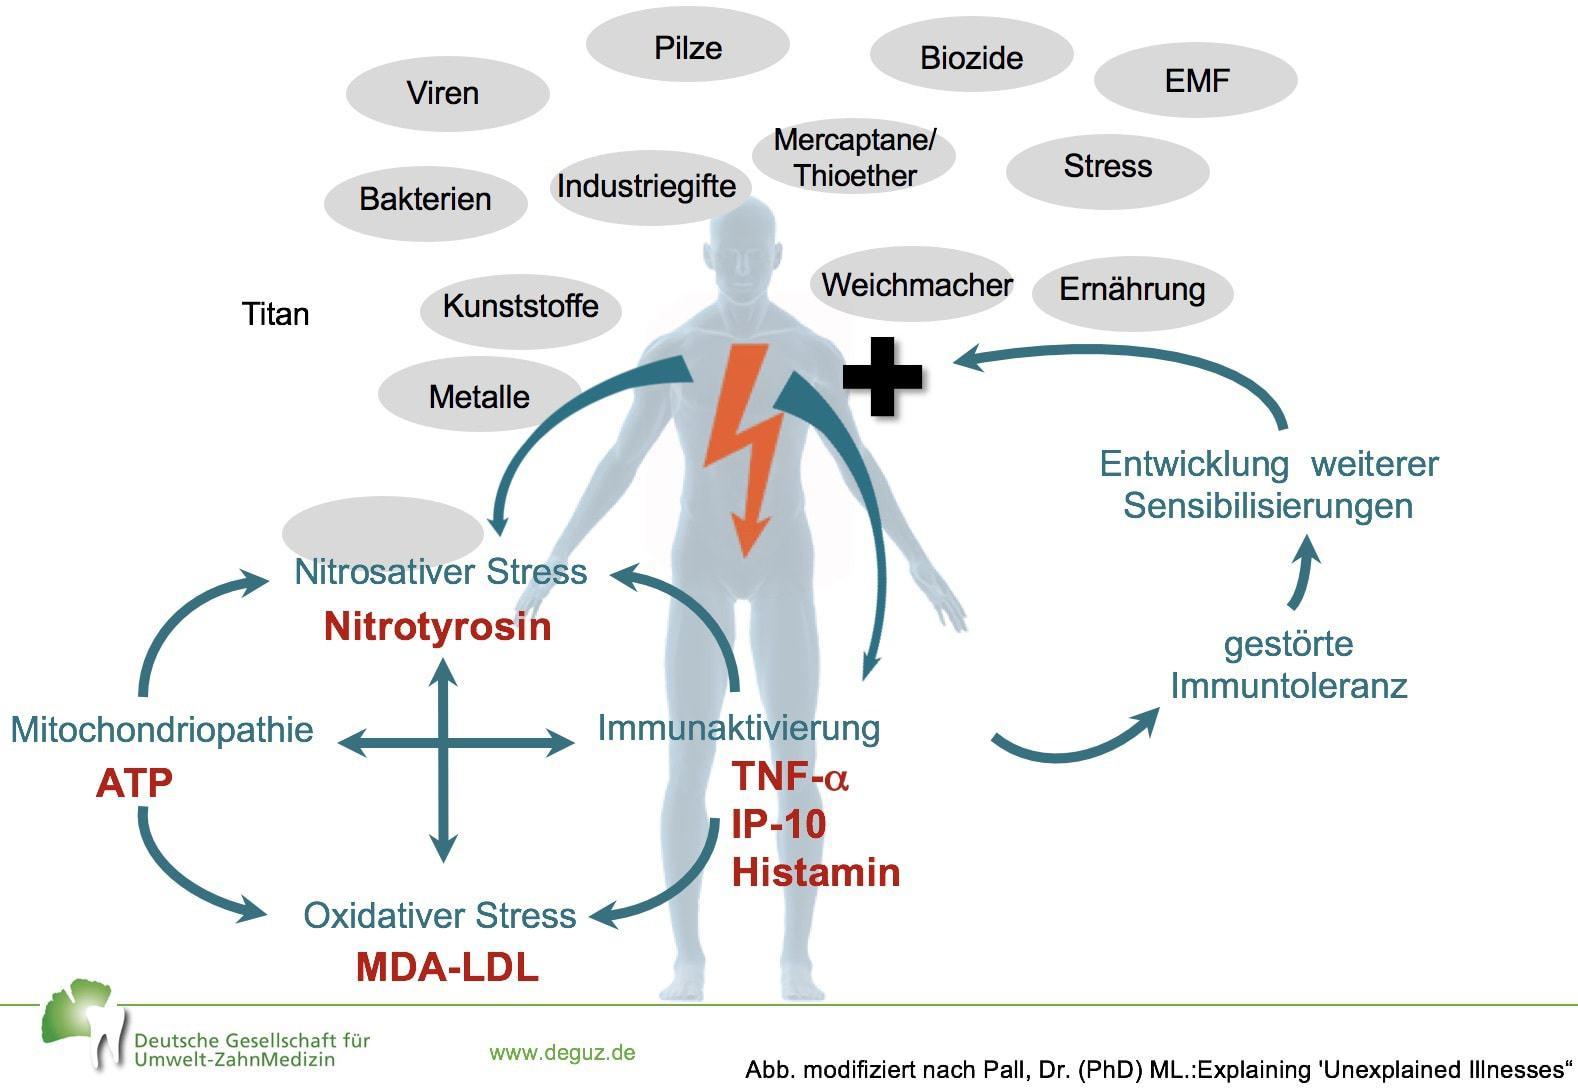 Ursachen chronischer Erkrankungen, Abbildung modifiziert nach Pall